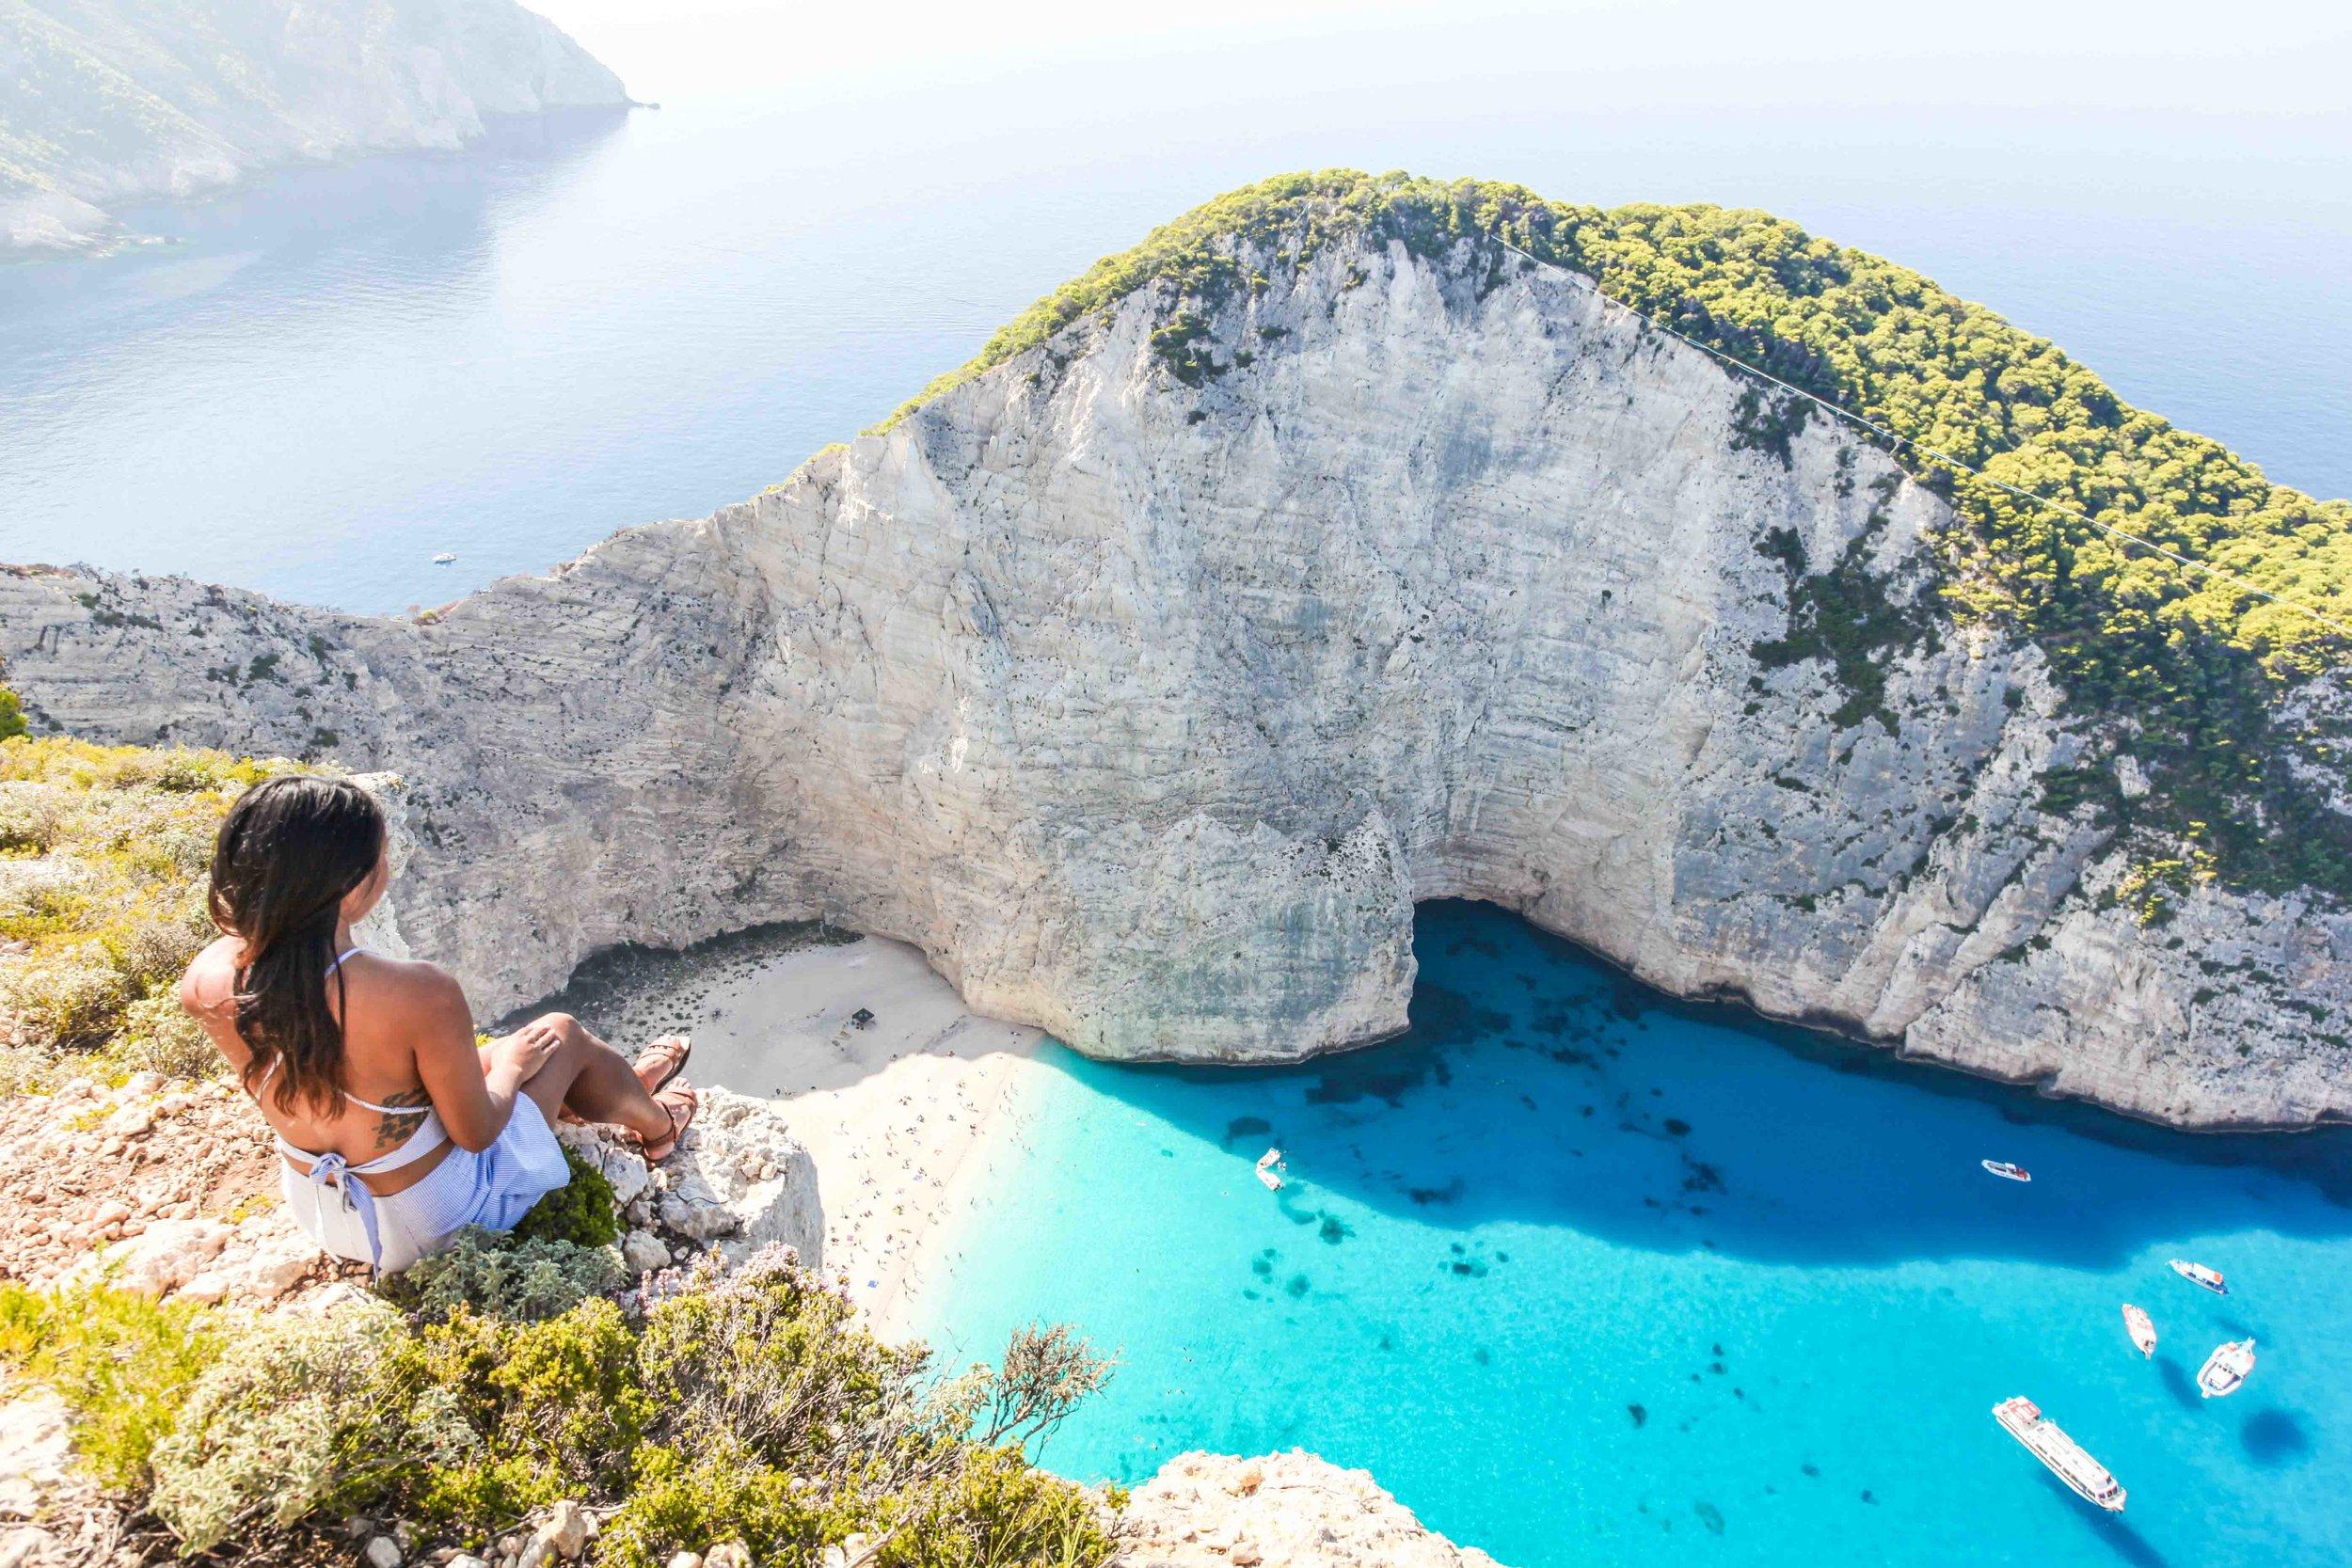 IMG_0463-shipwreck-navagio-beach-zakynthos-greece-trisa-taro.jpg